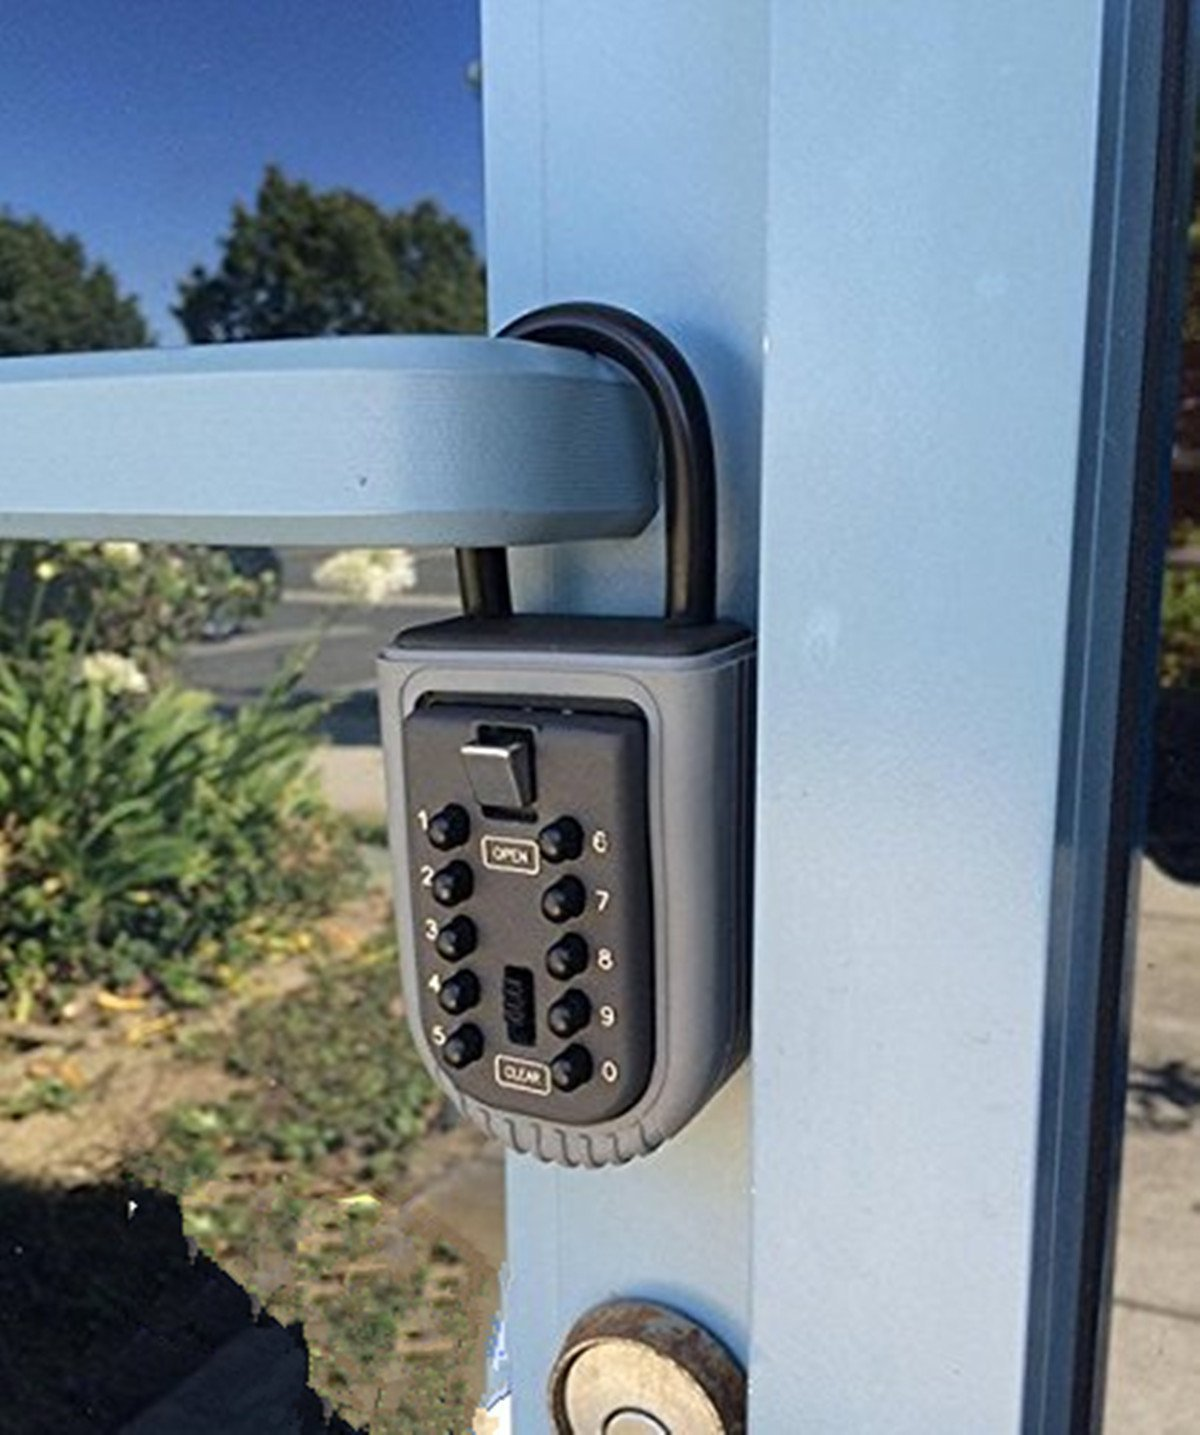 Key safe lock box Ksun Portable push-button combination lock exterior outdoor waterproof hide Padlock Box Secure Box Keys Holder combination for Home/House use Key Storage Lock Box by Ksun (Image #7)